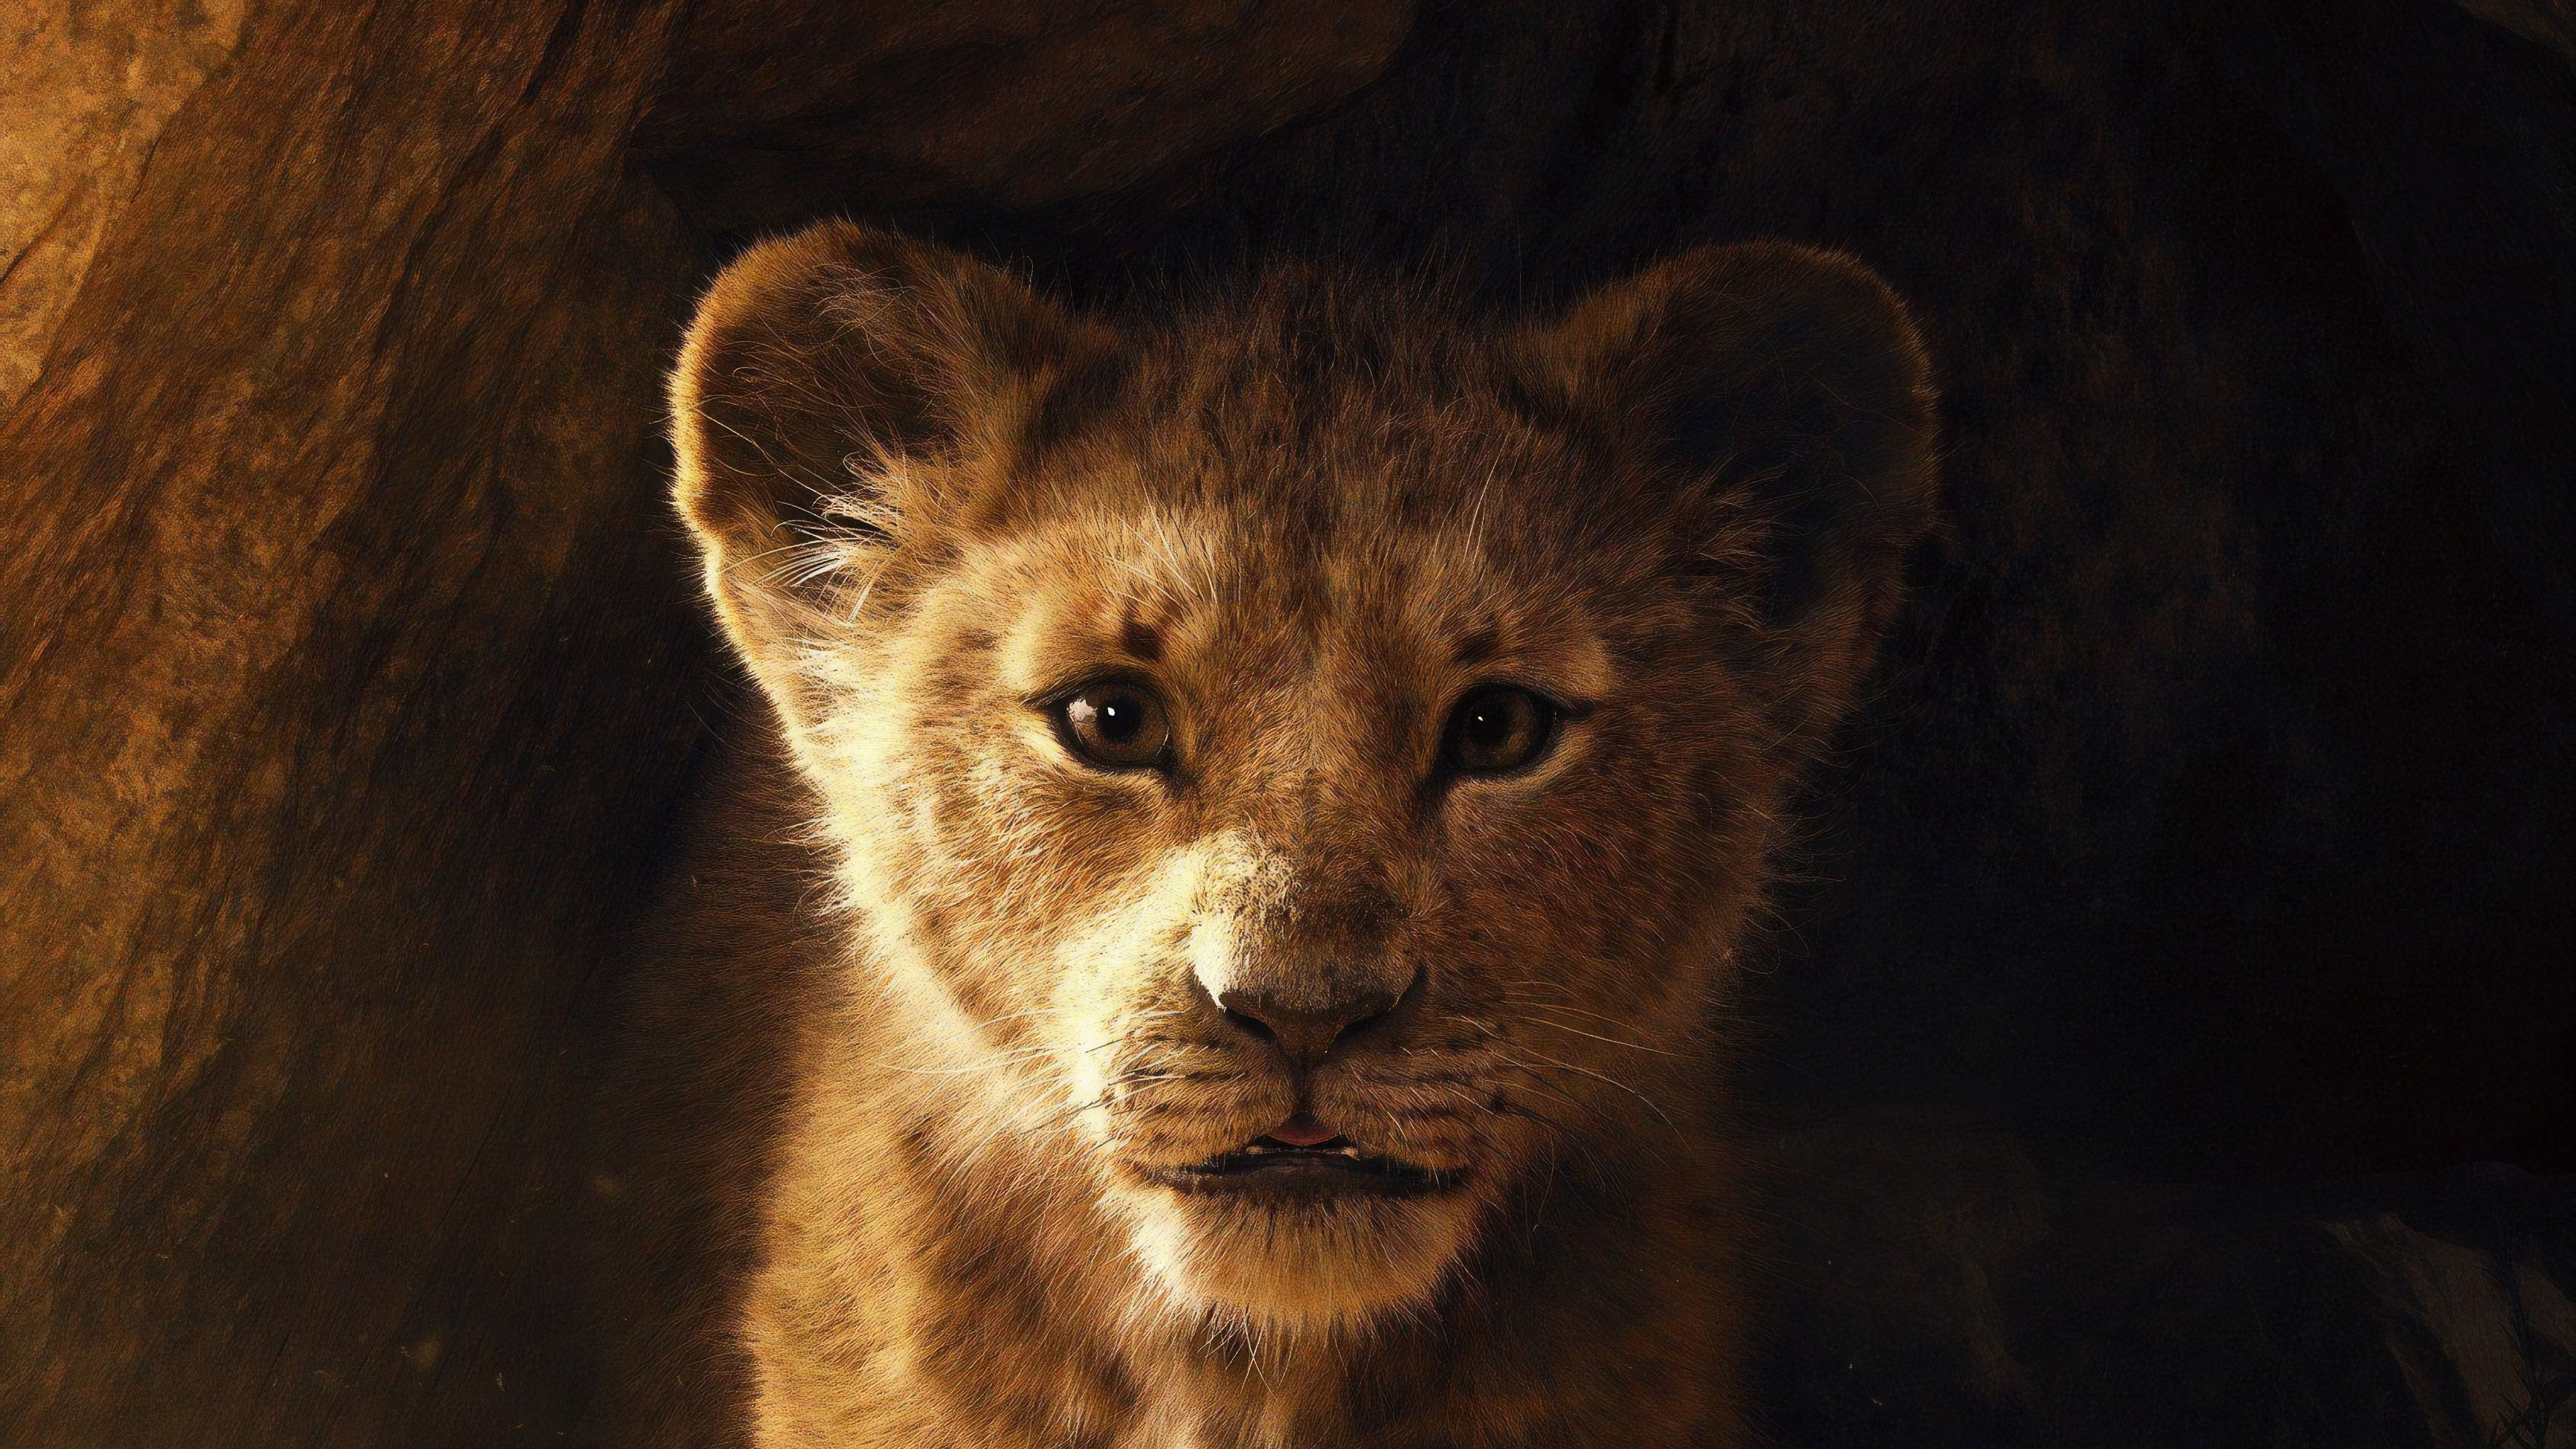 Lion King 4k Wallpapers Top Free Lion King 4k Backgrounds Wallpaperaccess